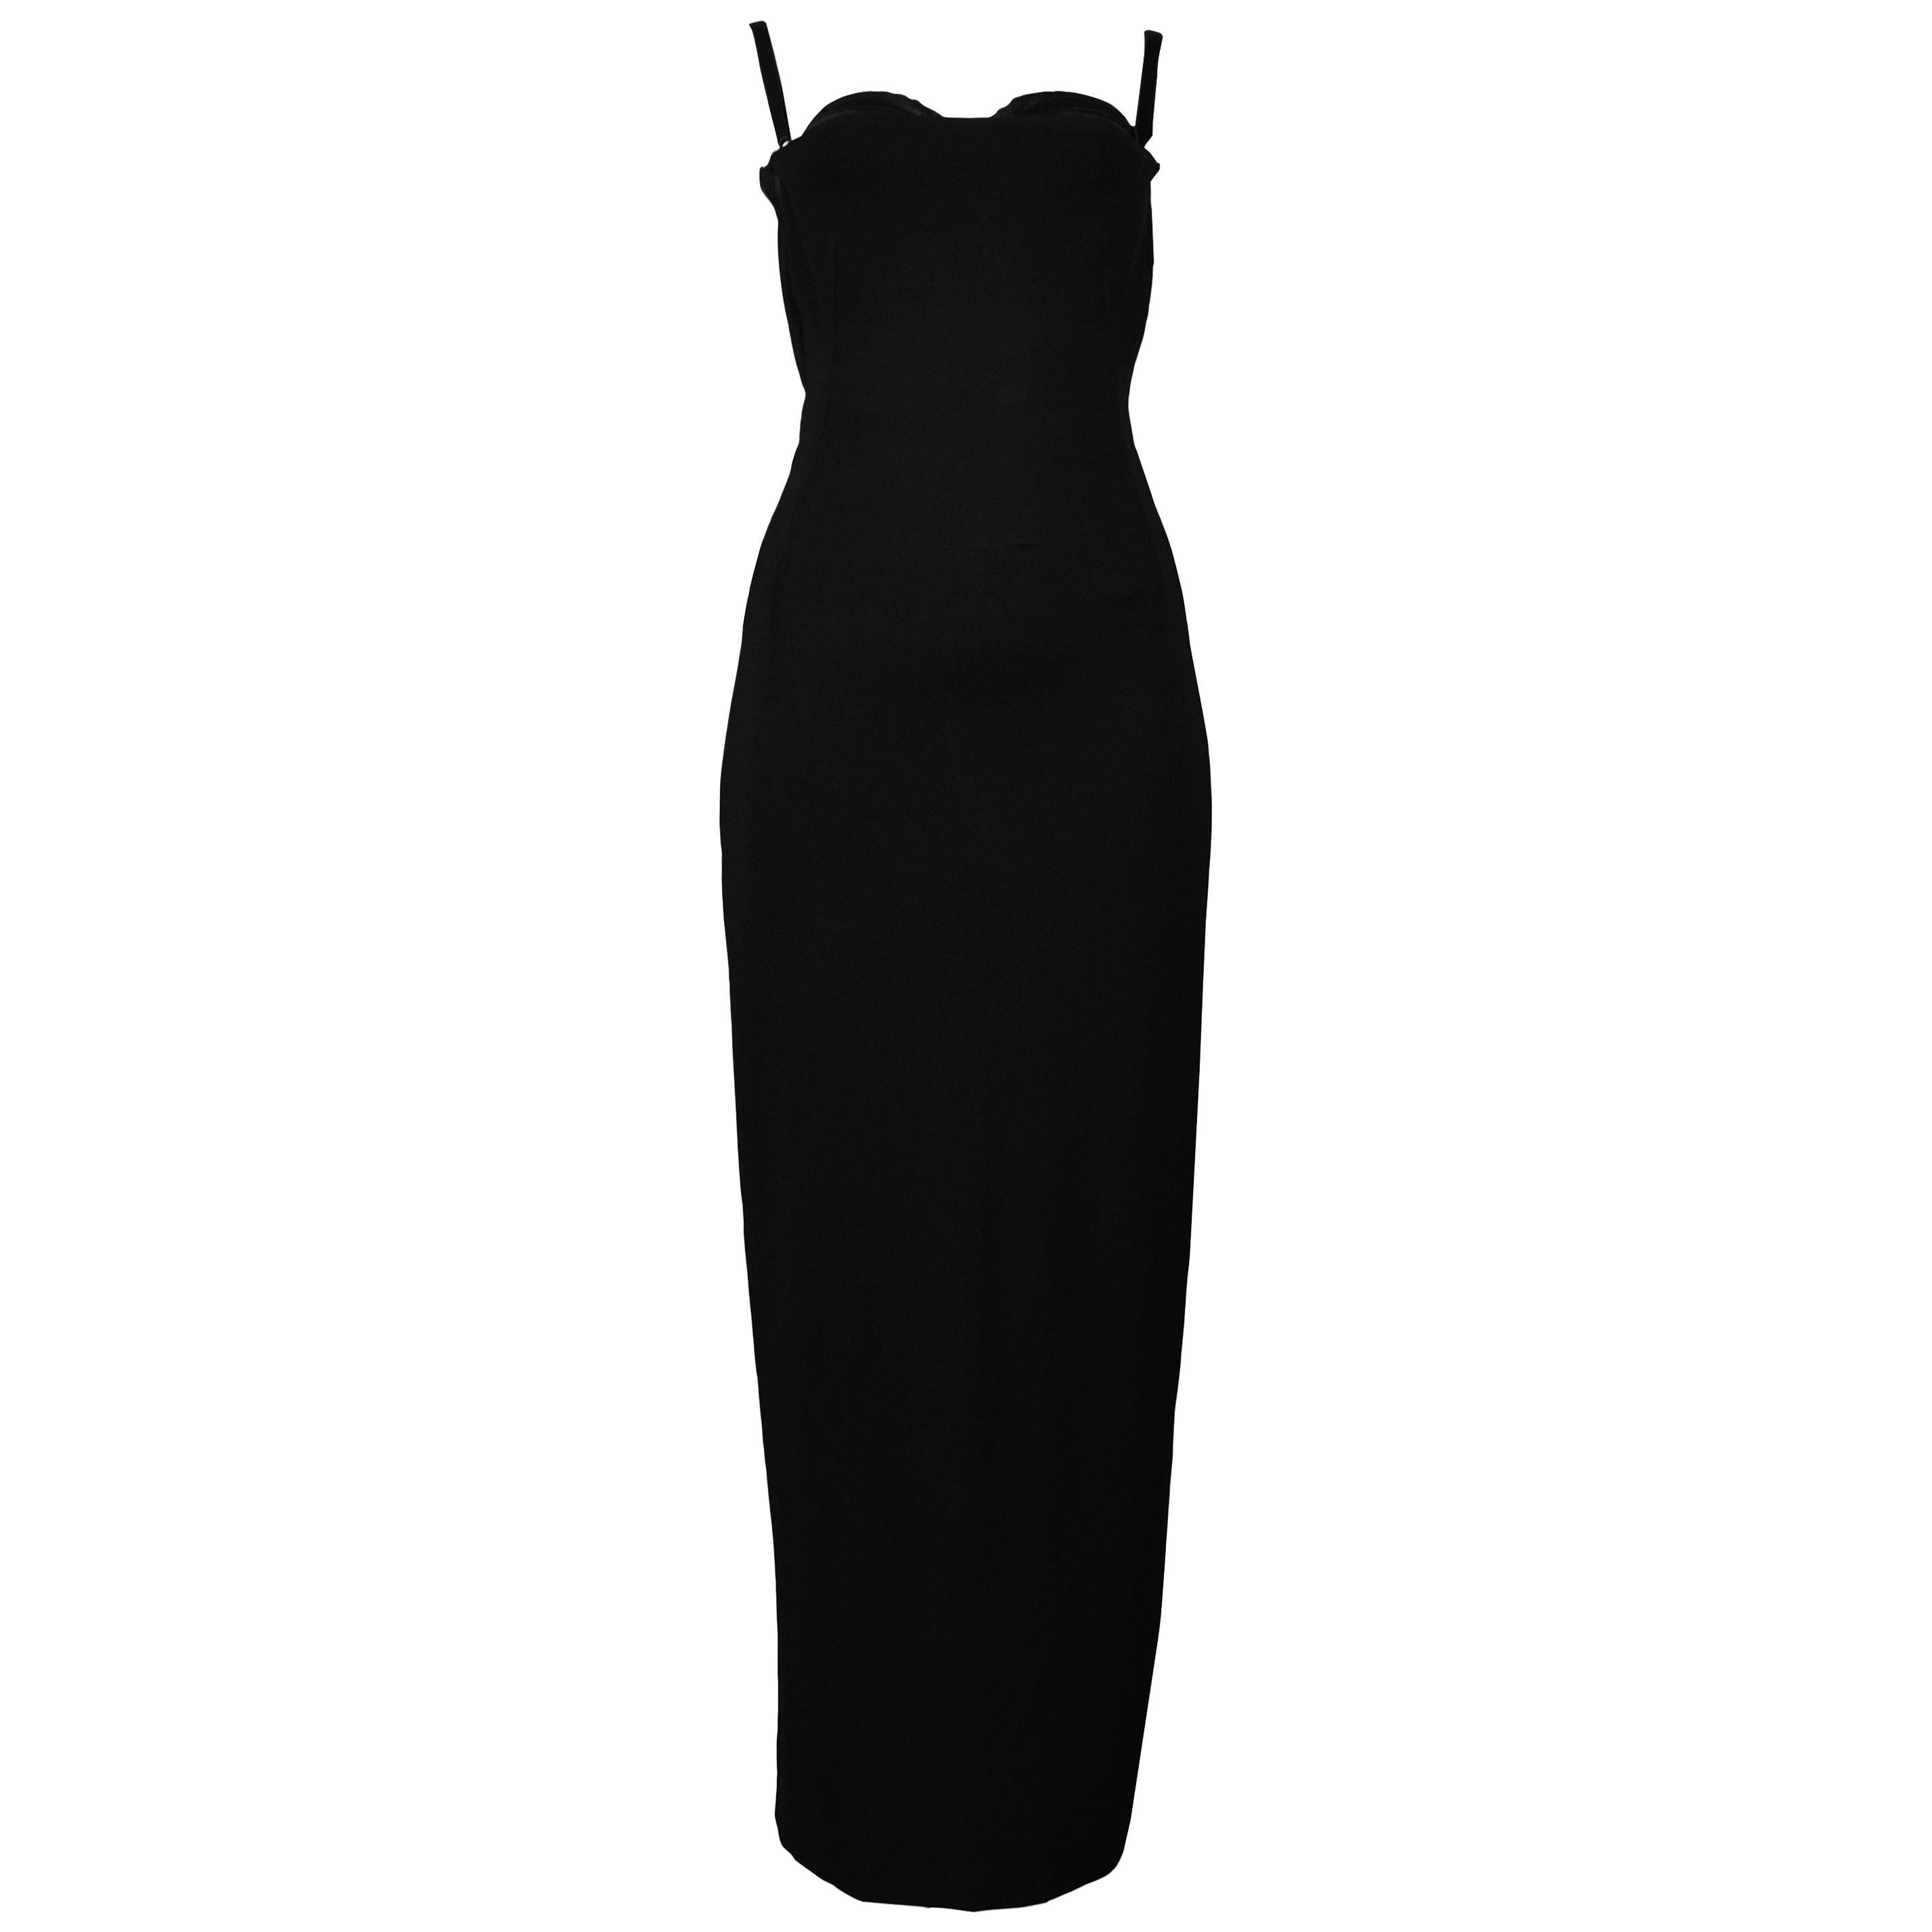 Vintage Dolce & Gabbana Black Bondage 2001 Runway Dress